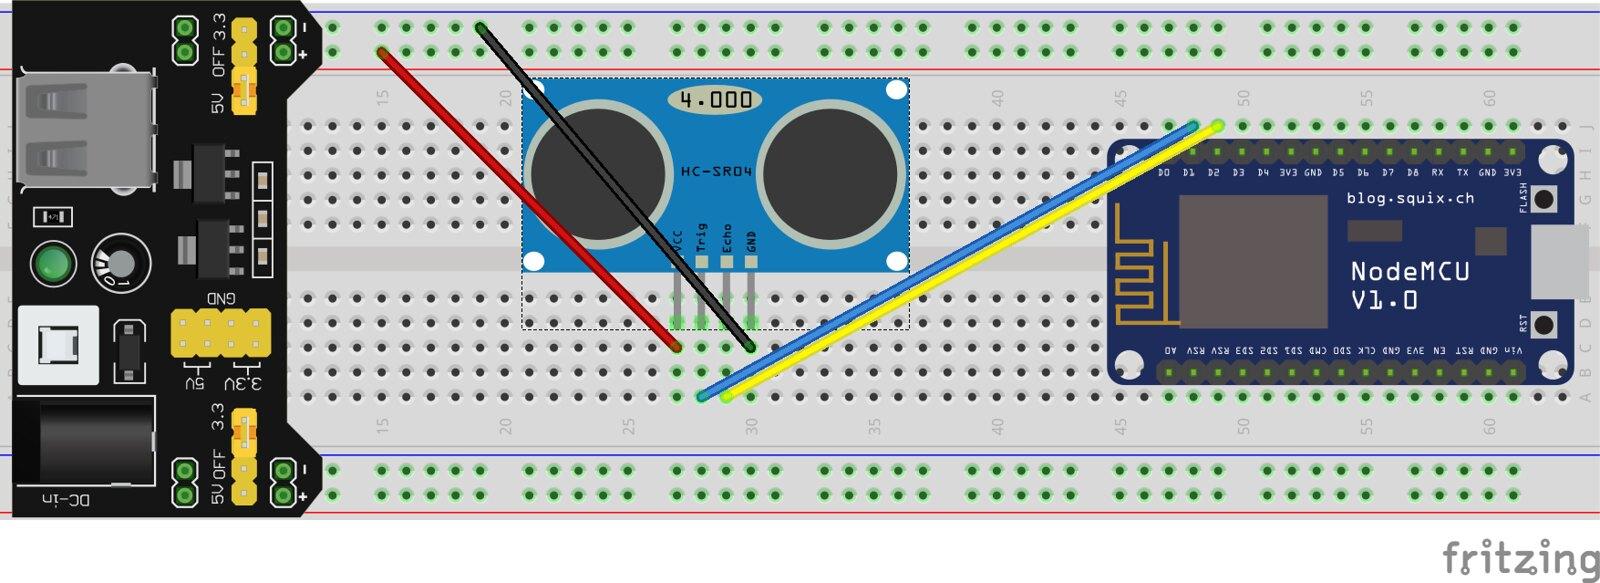 NodeMCU + Ultrasonic Sensor - Always reading zero - Everything ESP8266